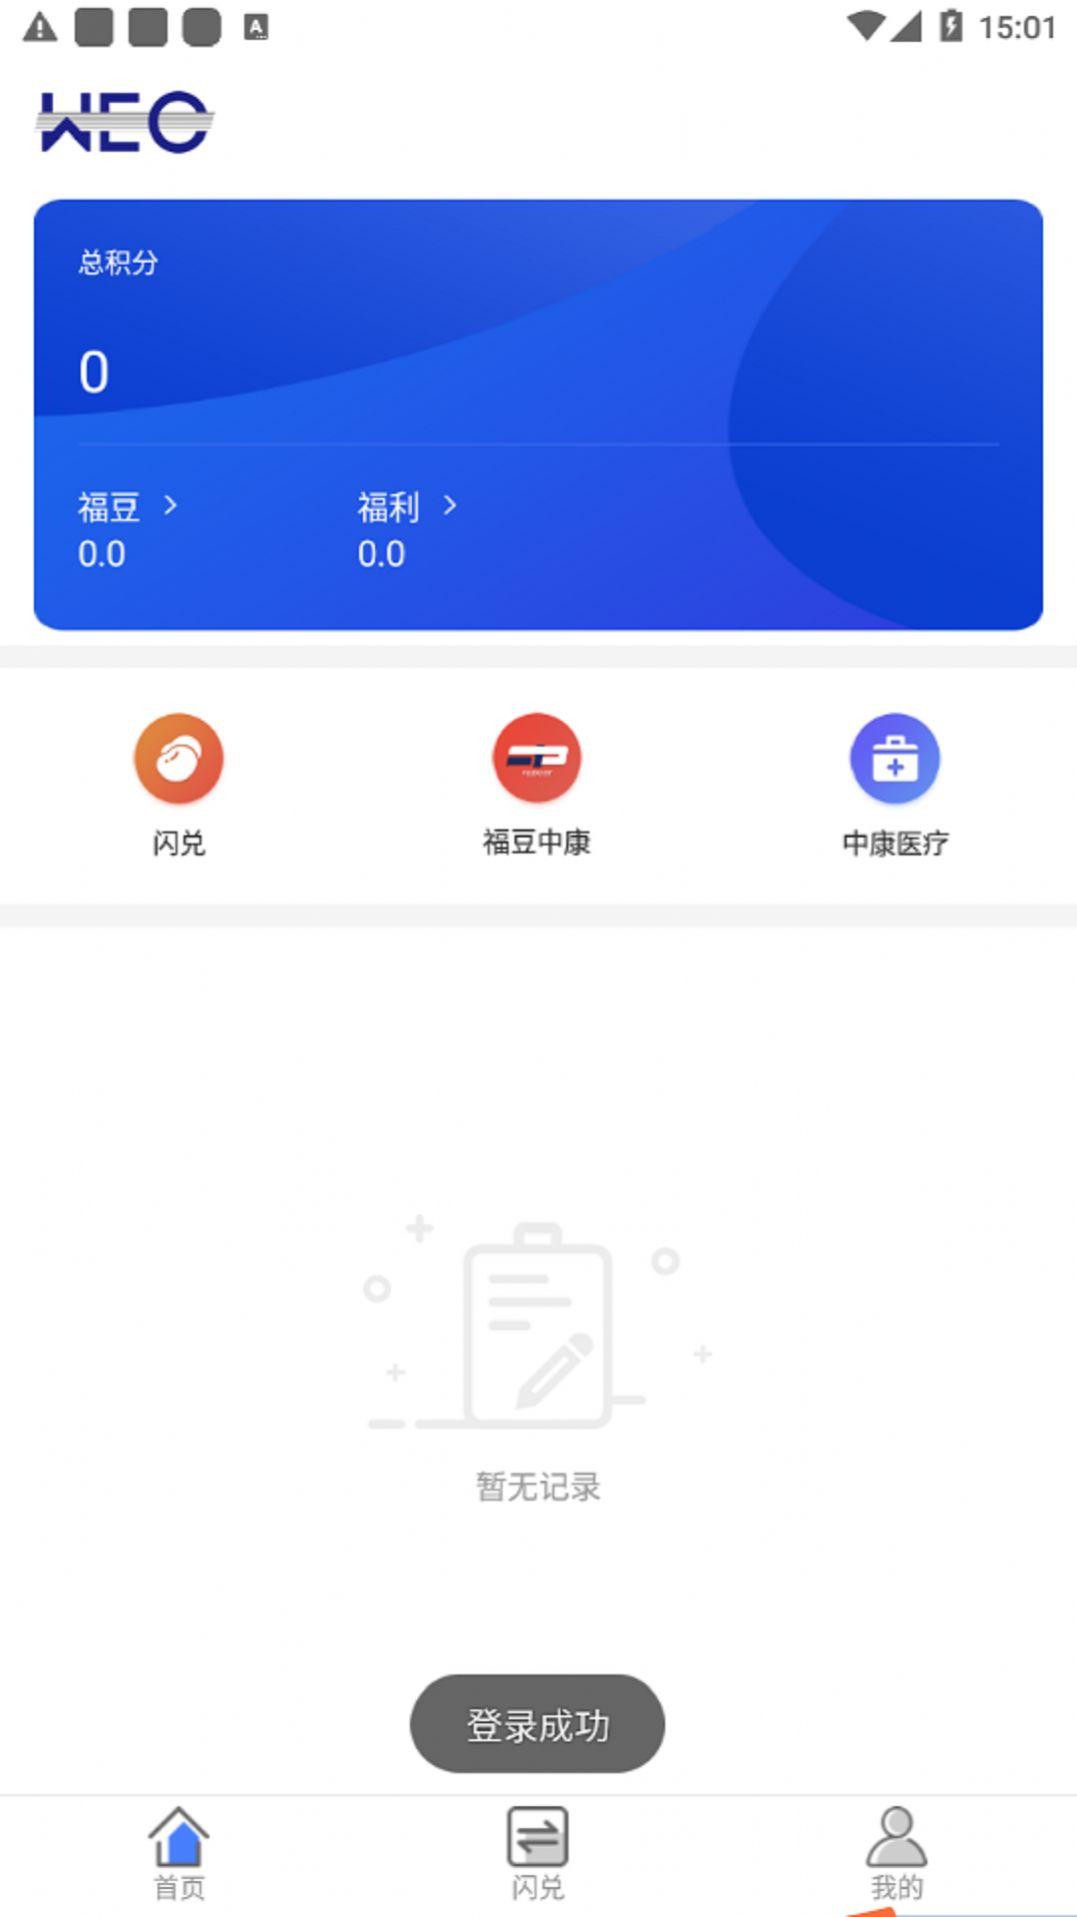 WEC积分app图片1